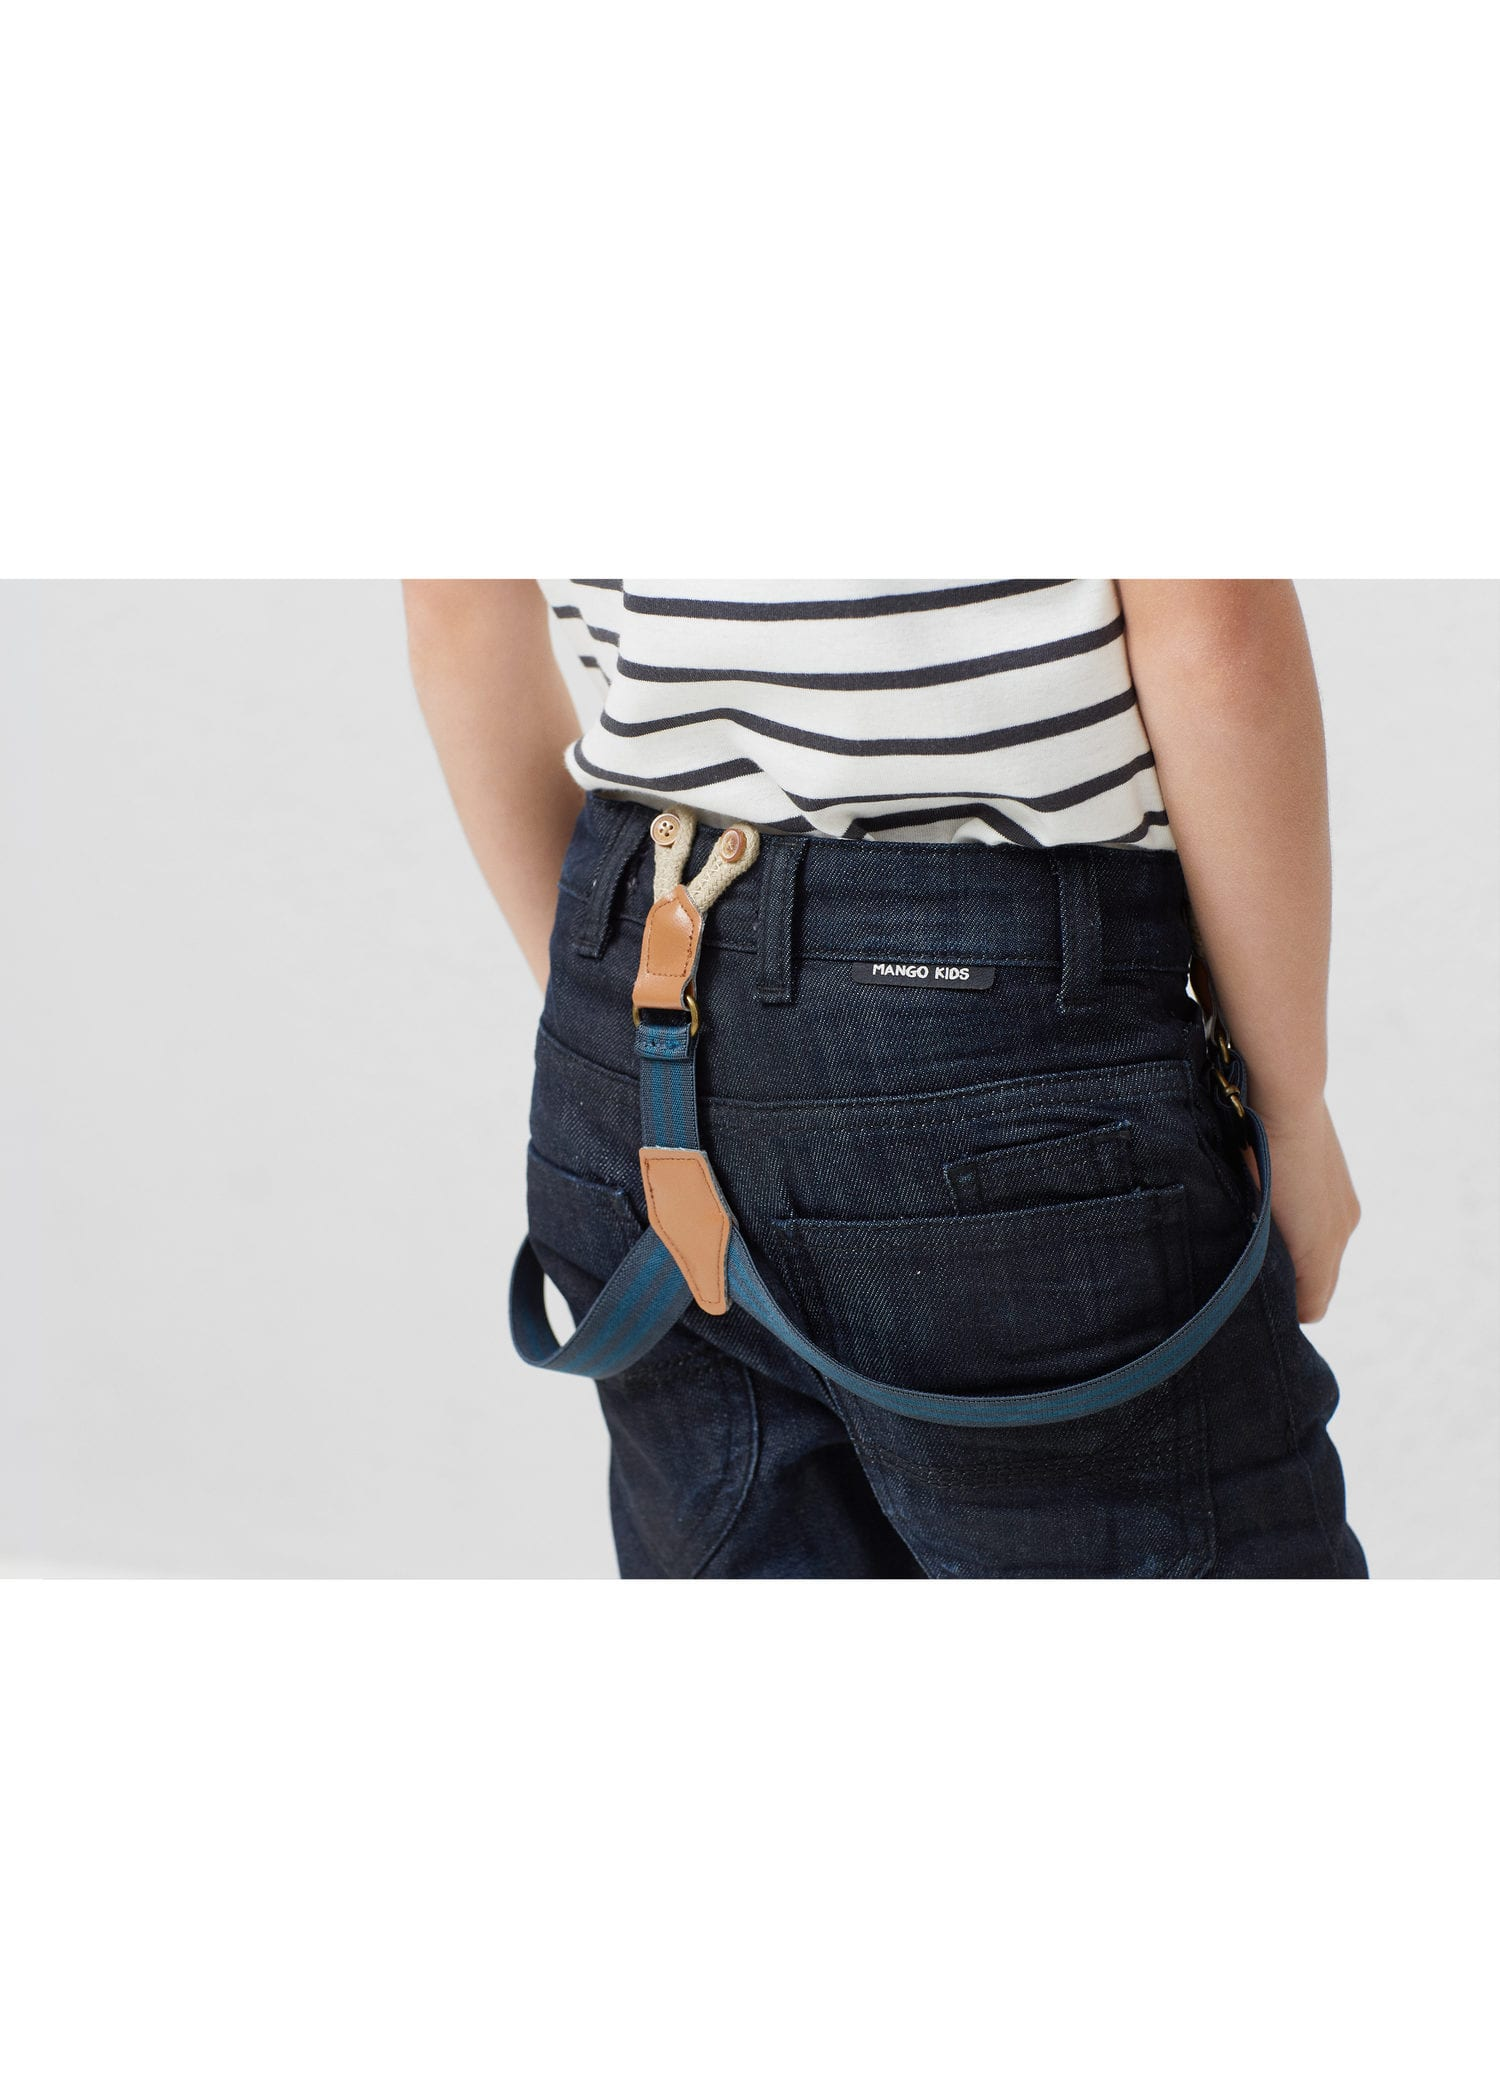 Jeans in karottenform Jungen   OUTLET Luxemburg